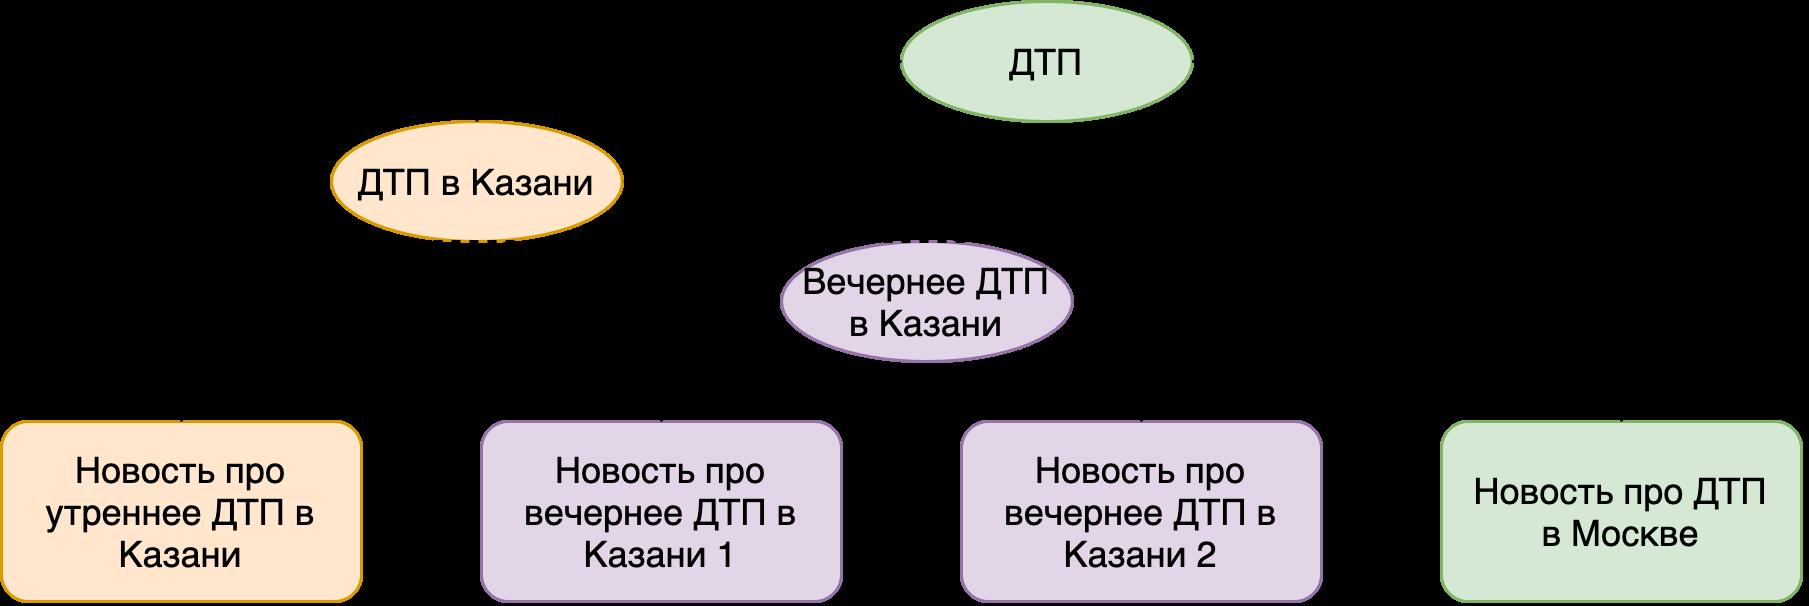 Агломеративная кластеризация